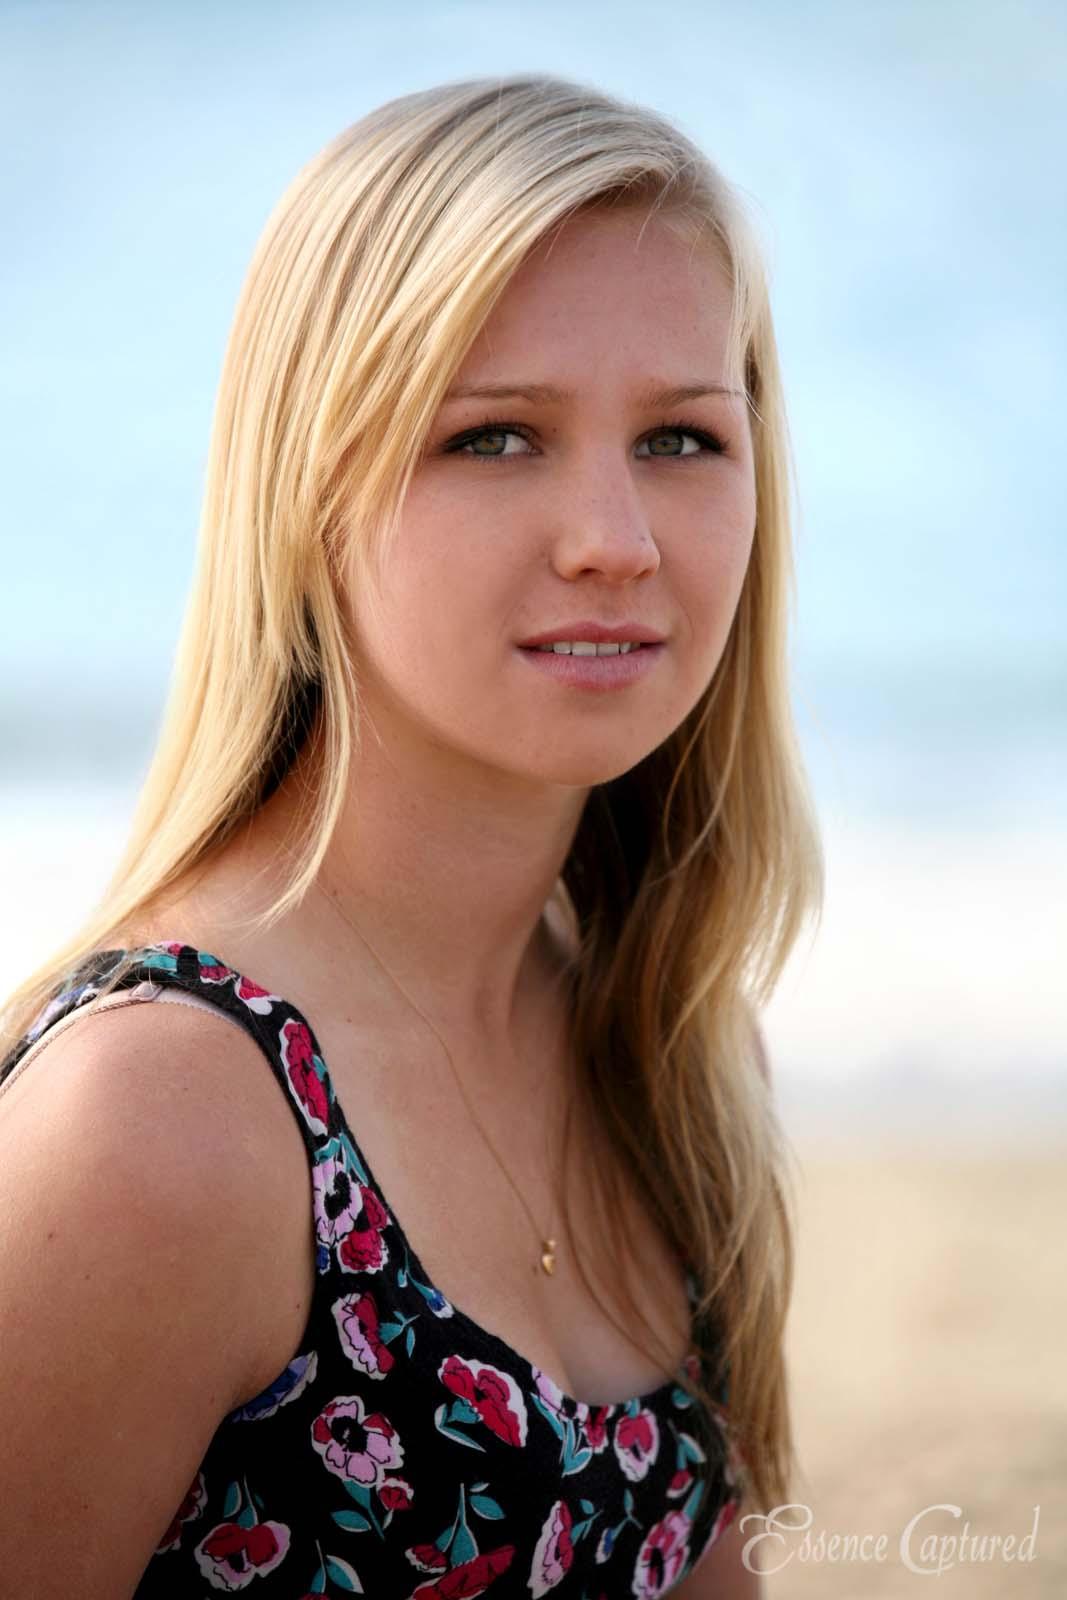 female high school senior portrait long blonde hair beach setting